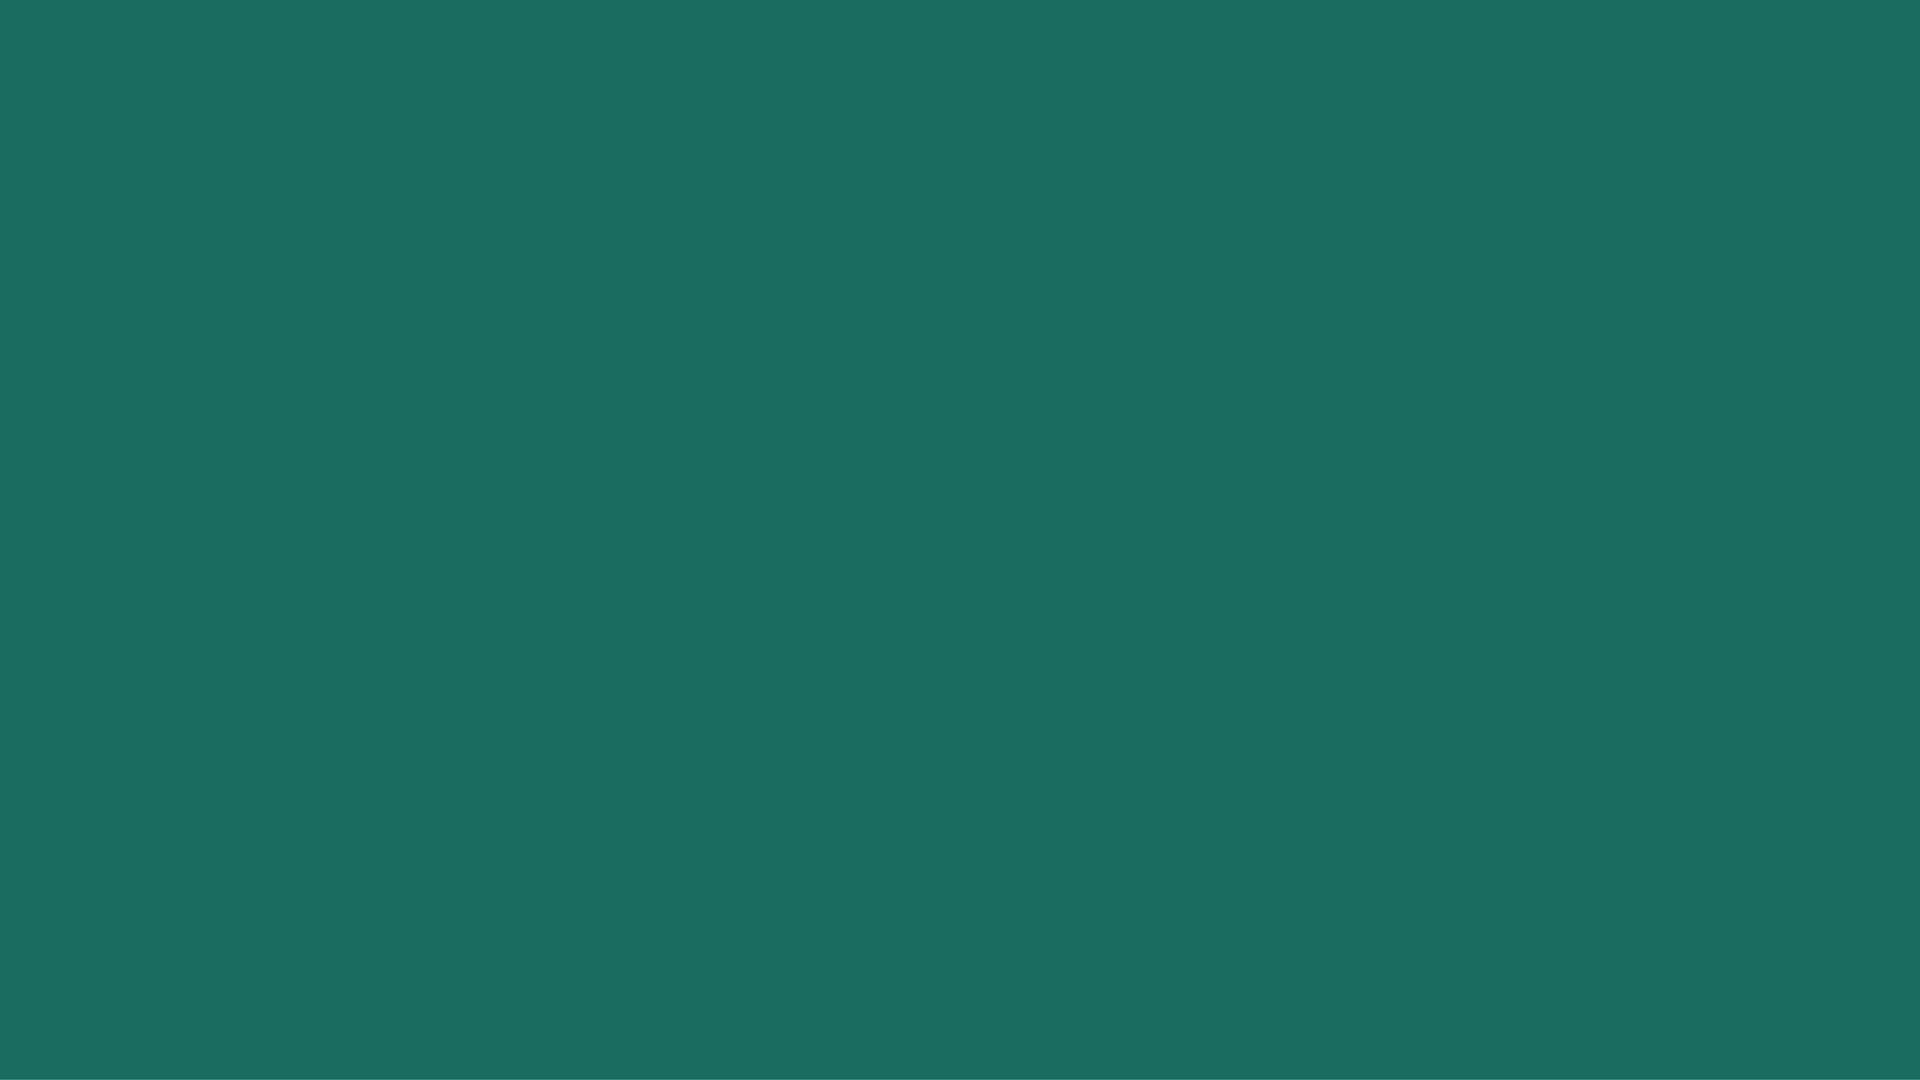 nedc-colour-background